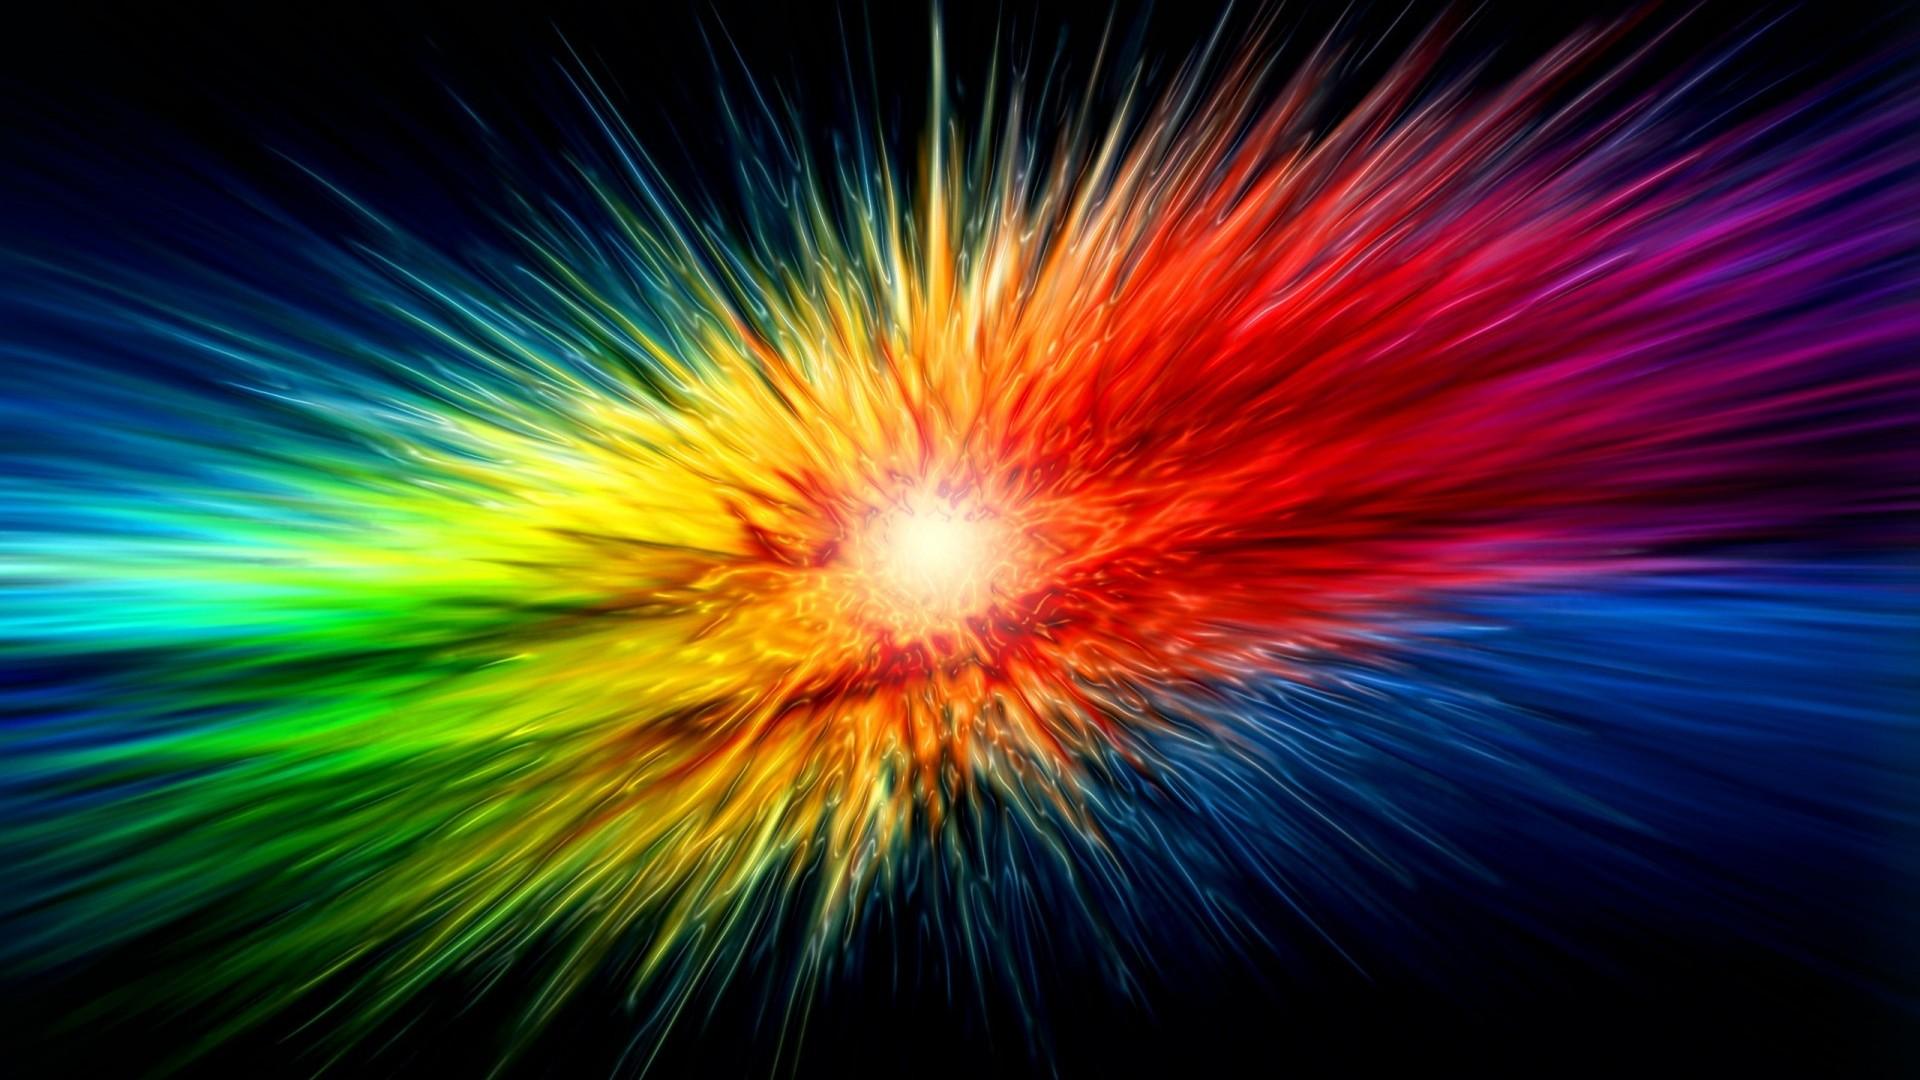 supernova rainbow explosion 1920x1080 hd wallpaper abstract 3d 1920x1080